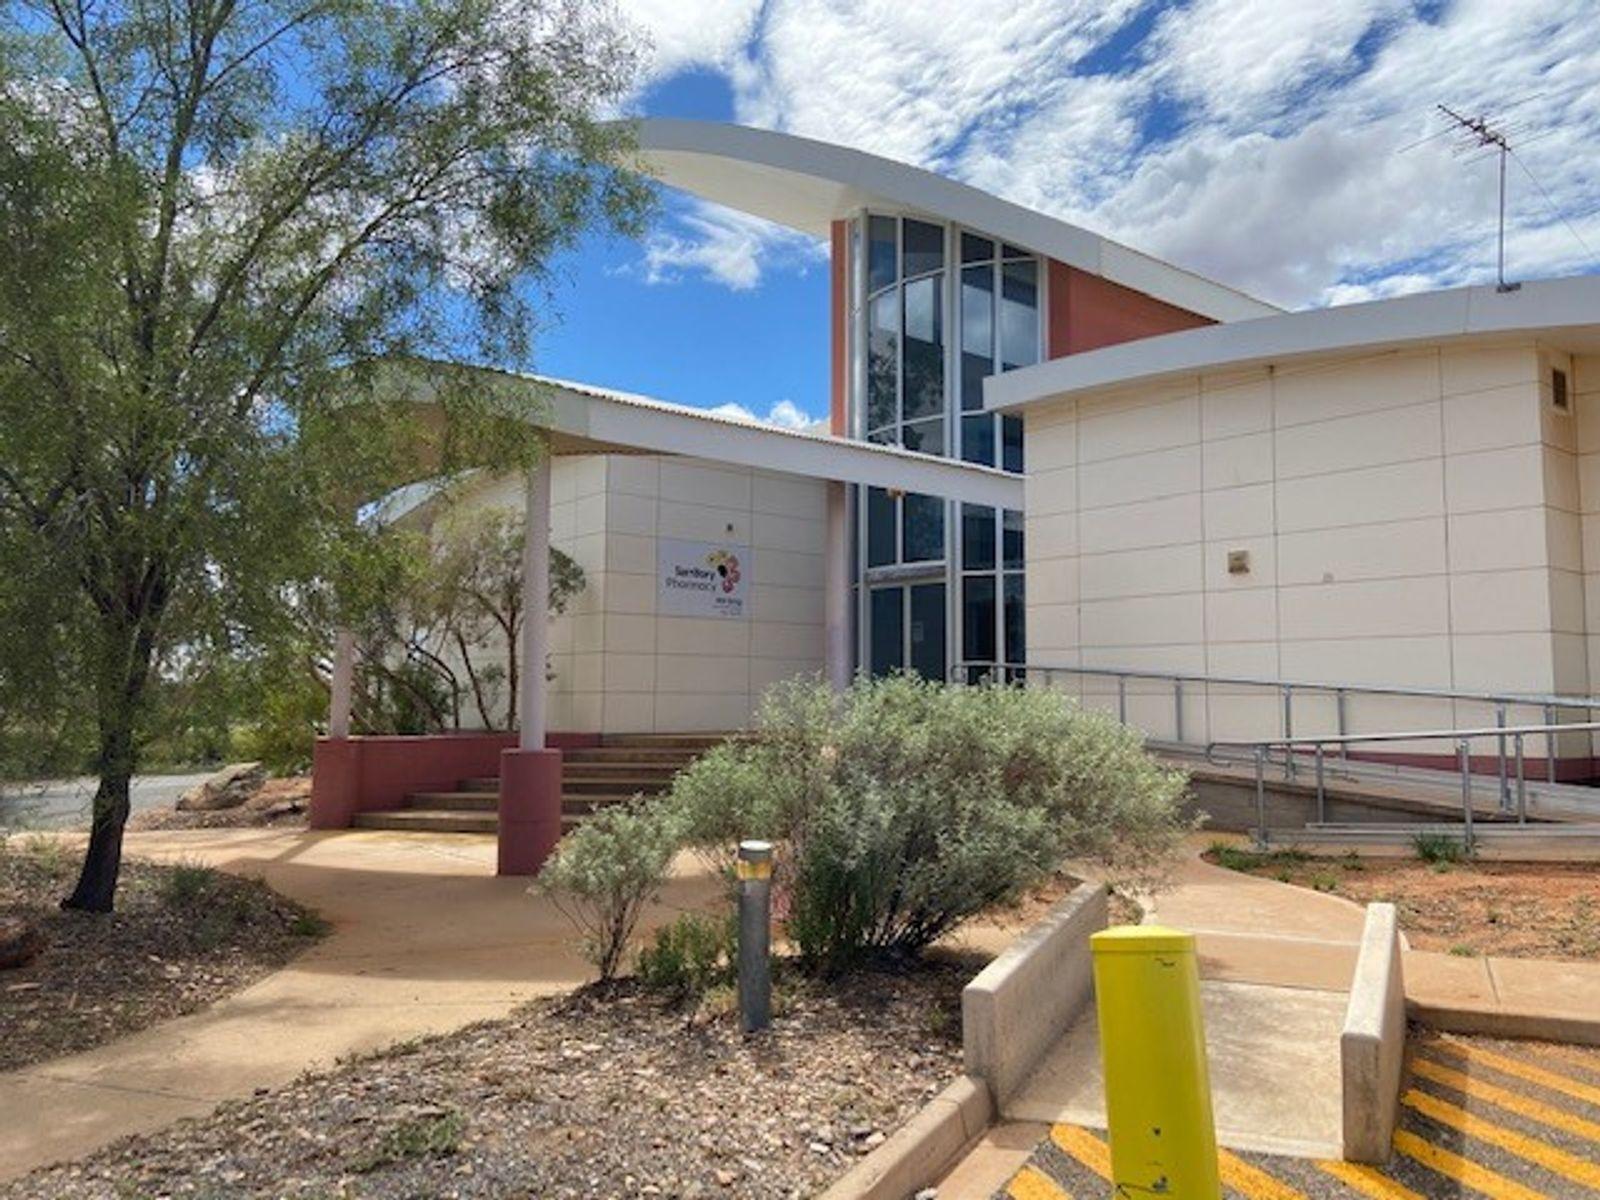 201B/2 Brigg Street, Alice Springs, NT 0870